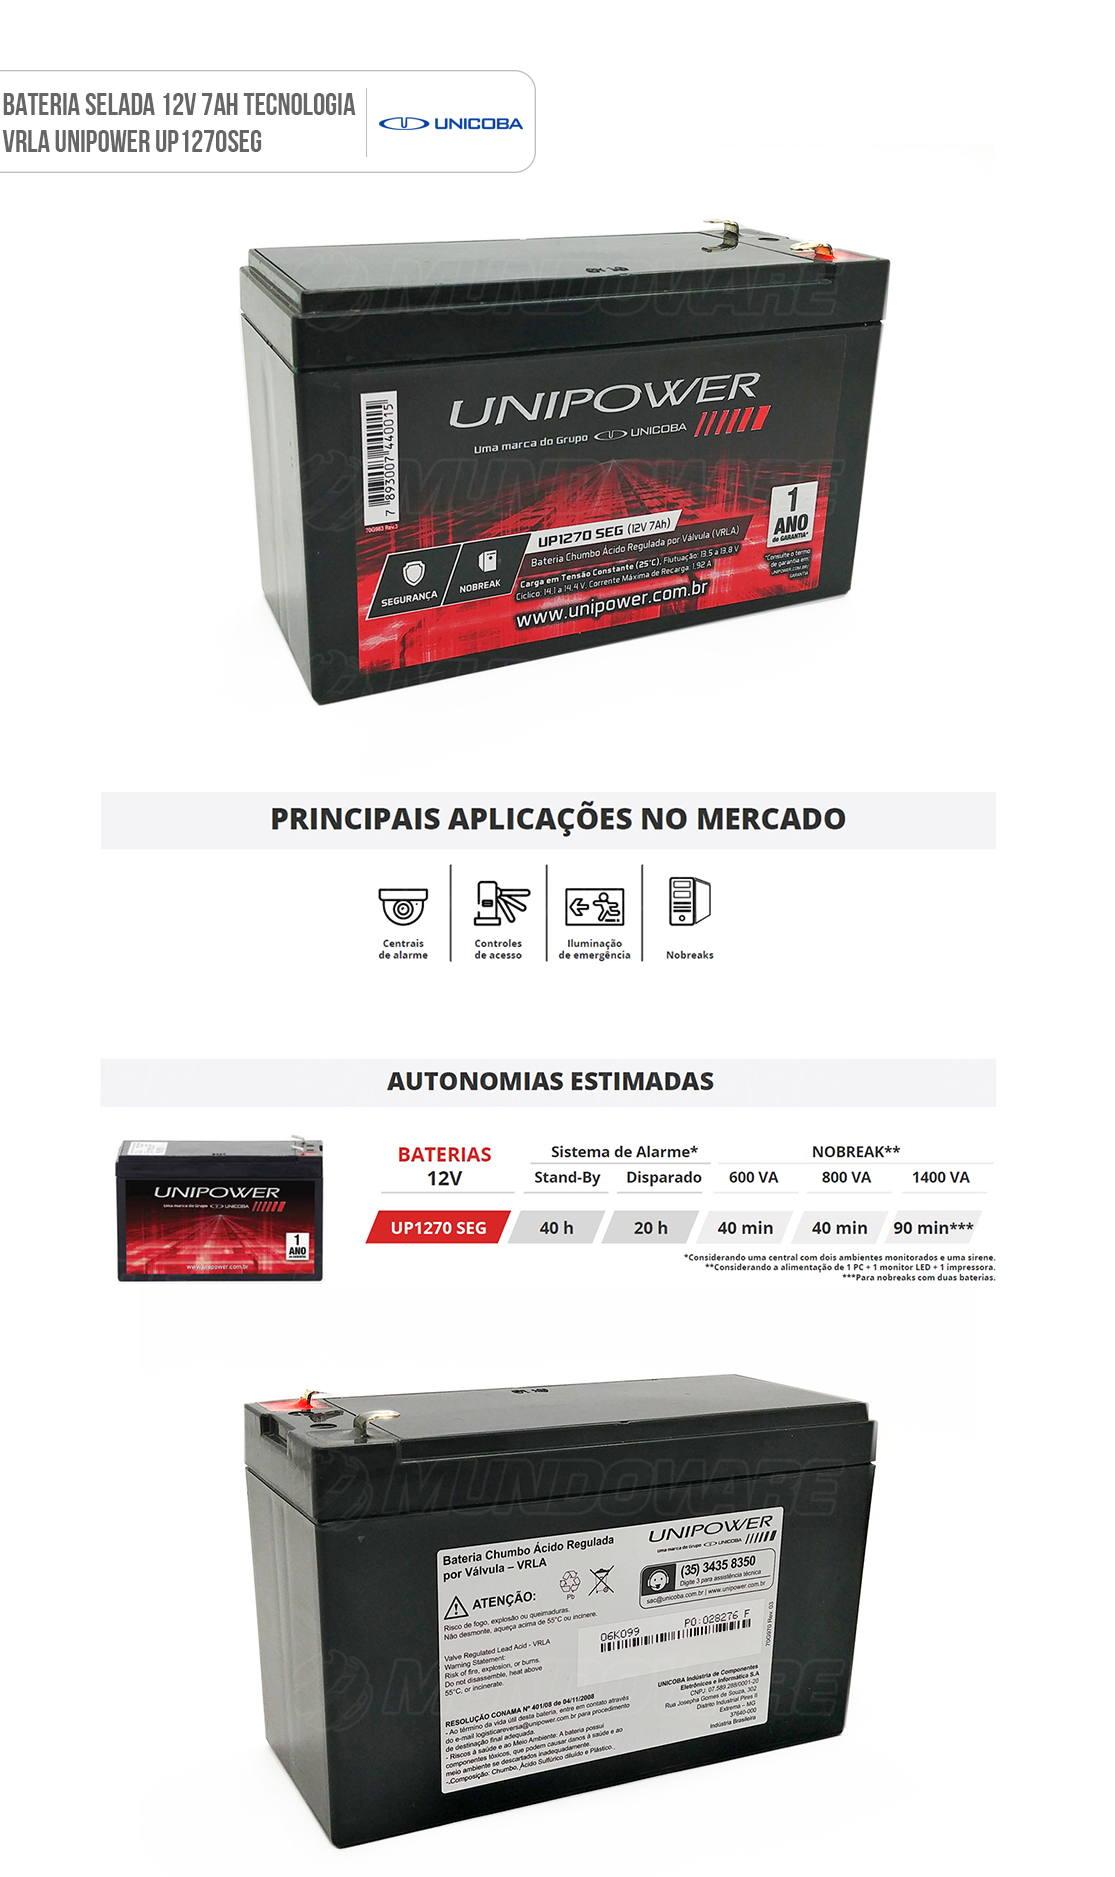 Bateria 12V 7Ah Selada para Nobreak Sistema de Segurança e Alarme VRLA Unipower UP1270 SEG